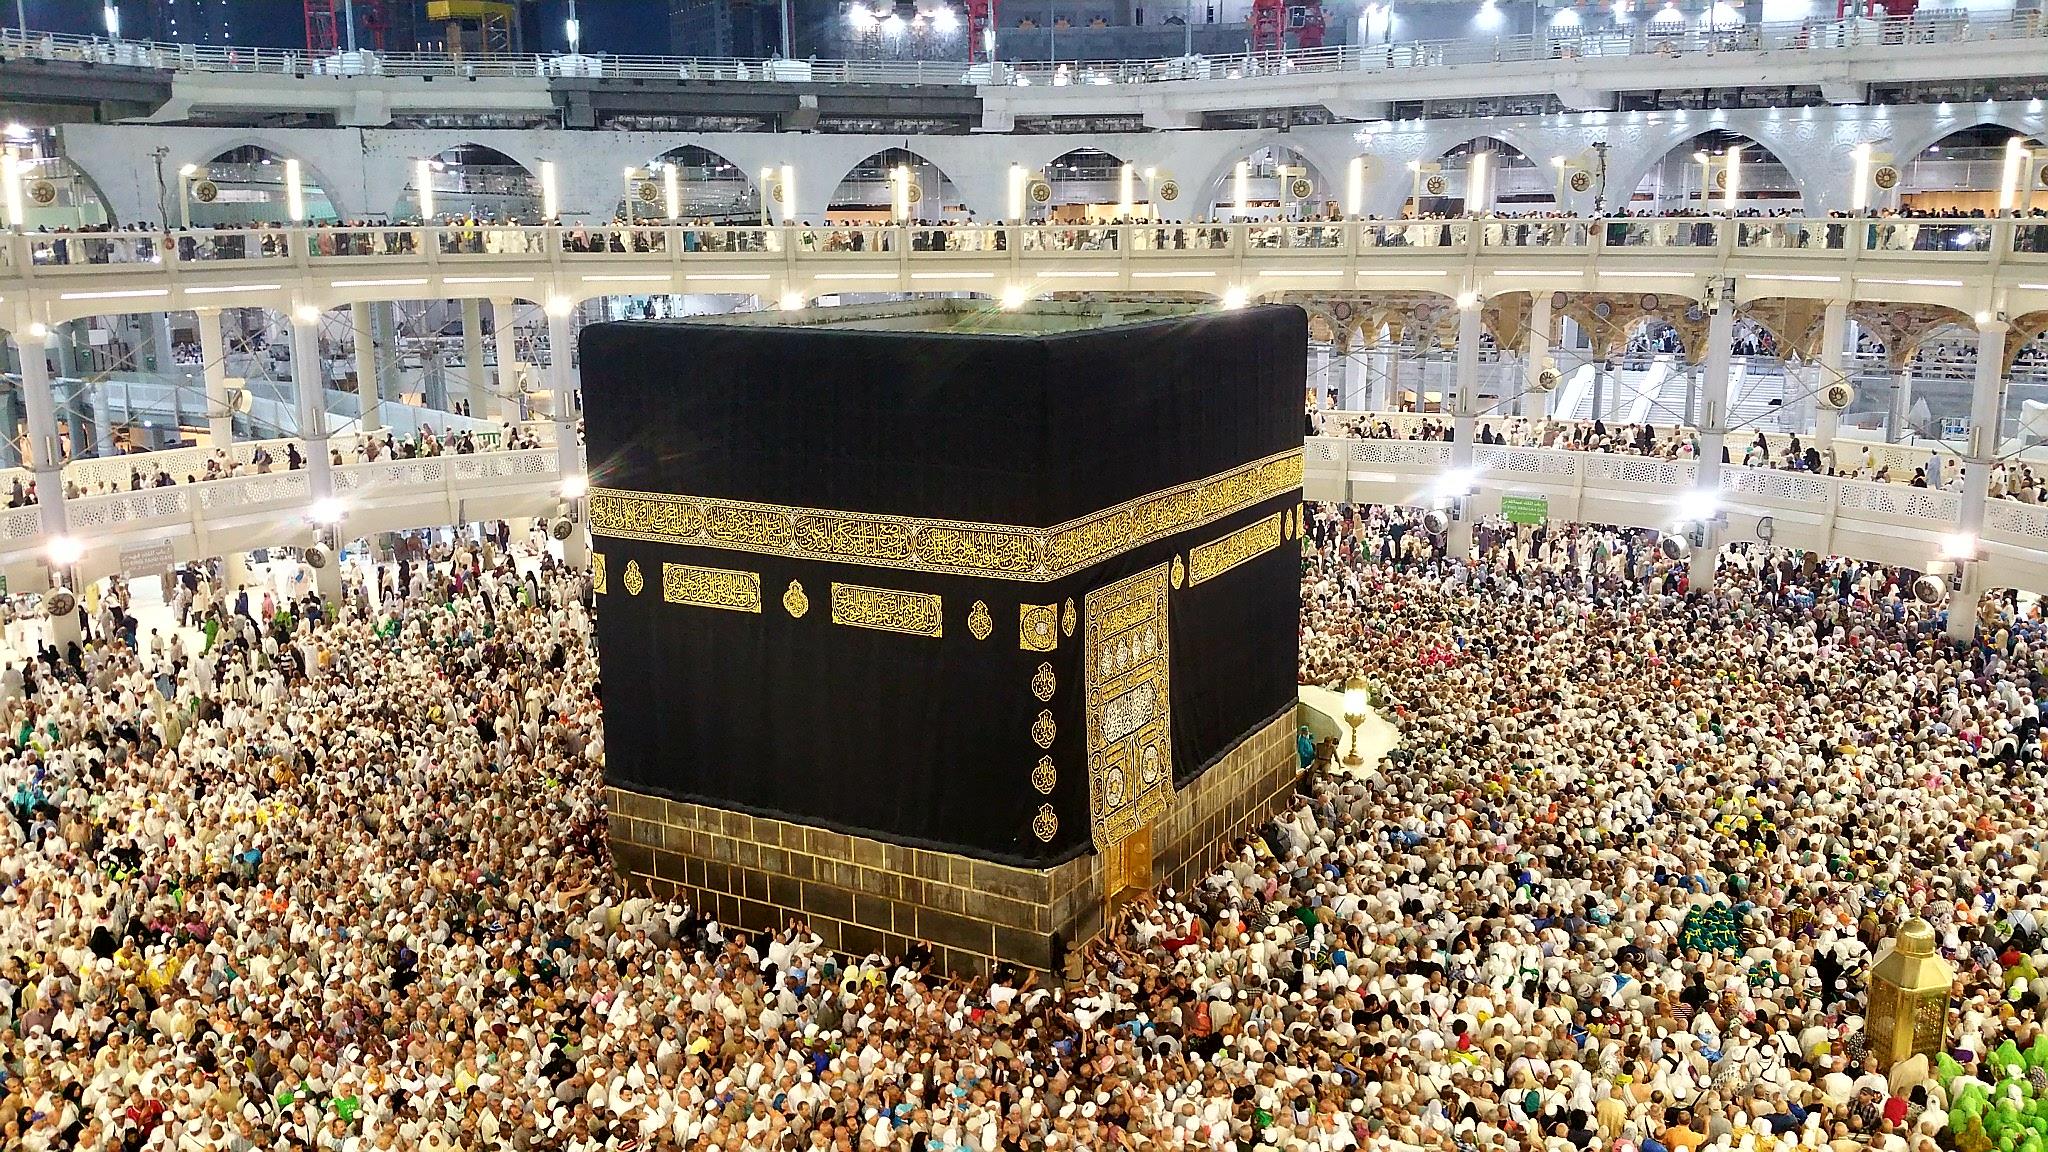 Kaa'bah during Hajj